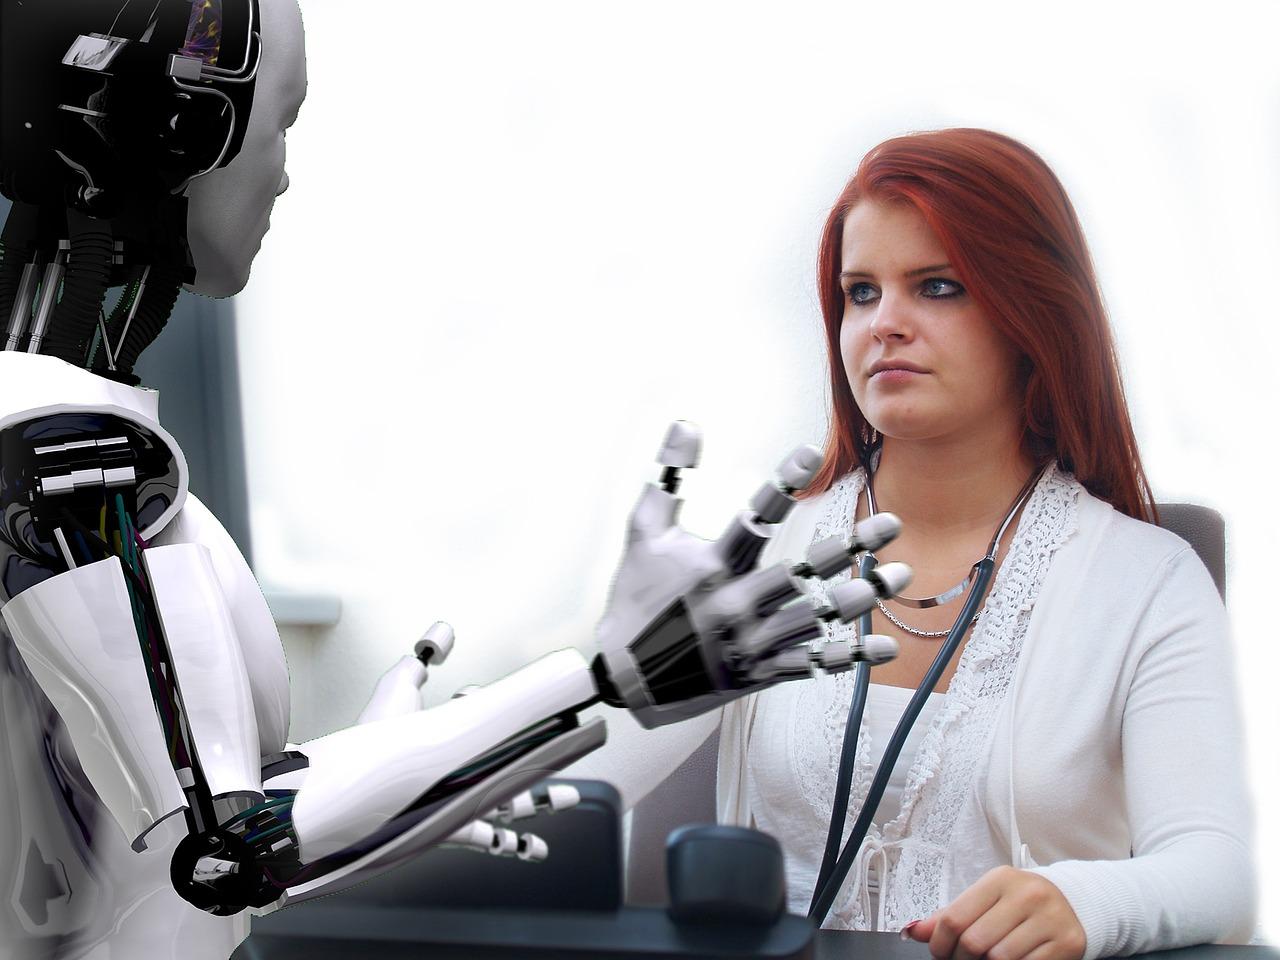 robots for dementia care